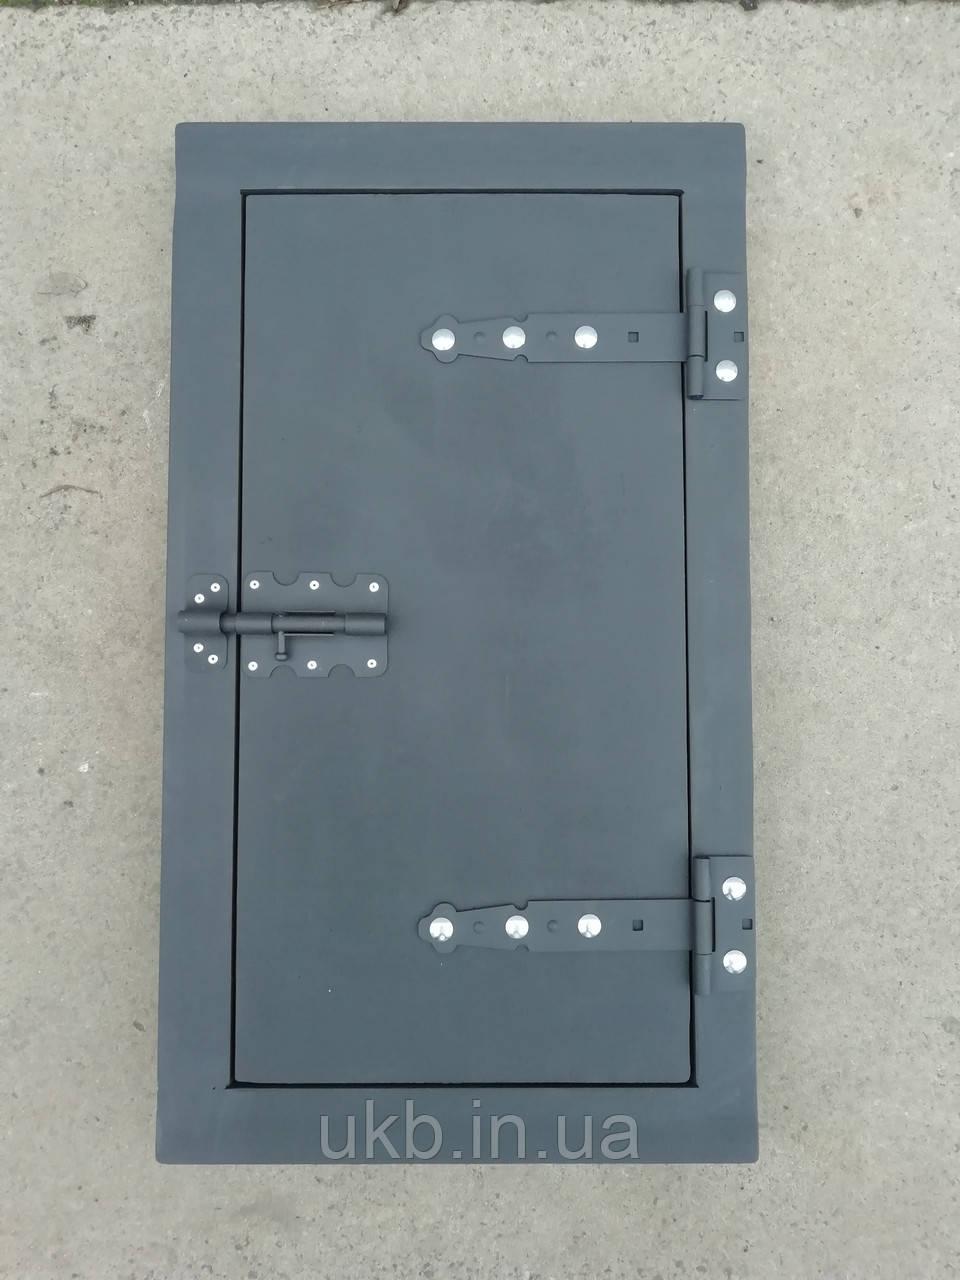 Дверца коптильни чугунная 720*400 мм